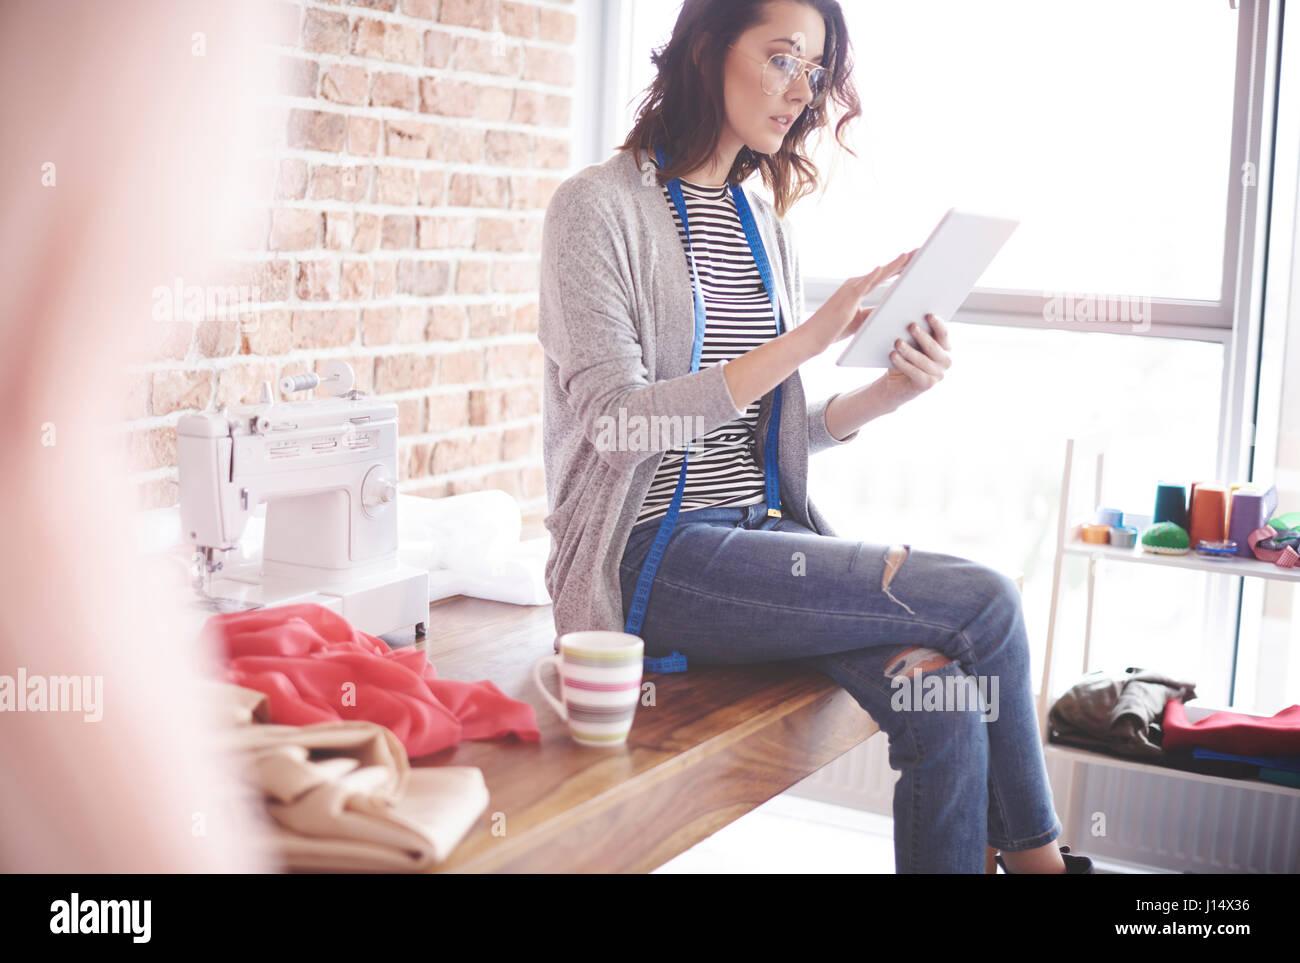 Fashion designer with digital tablet at her studio - Stock Image